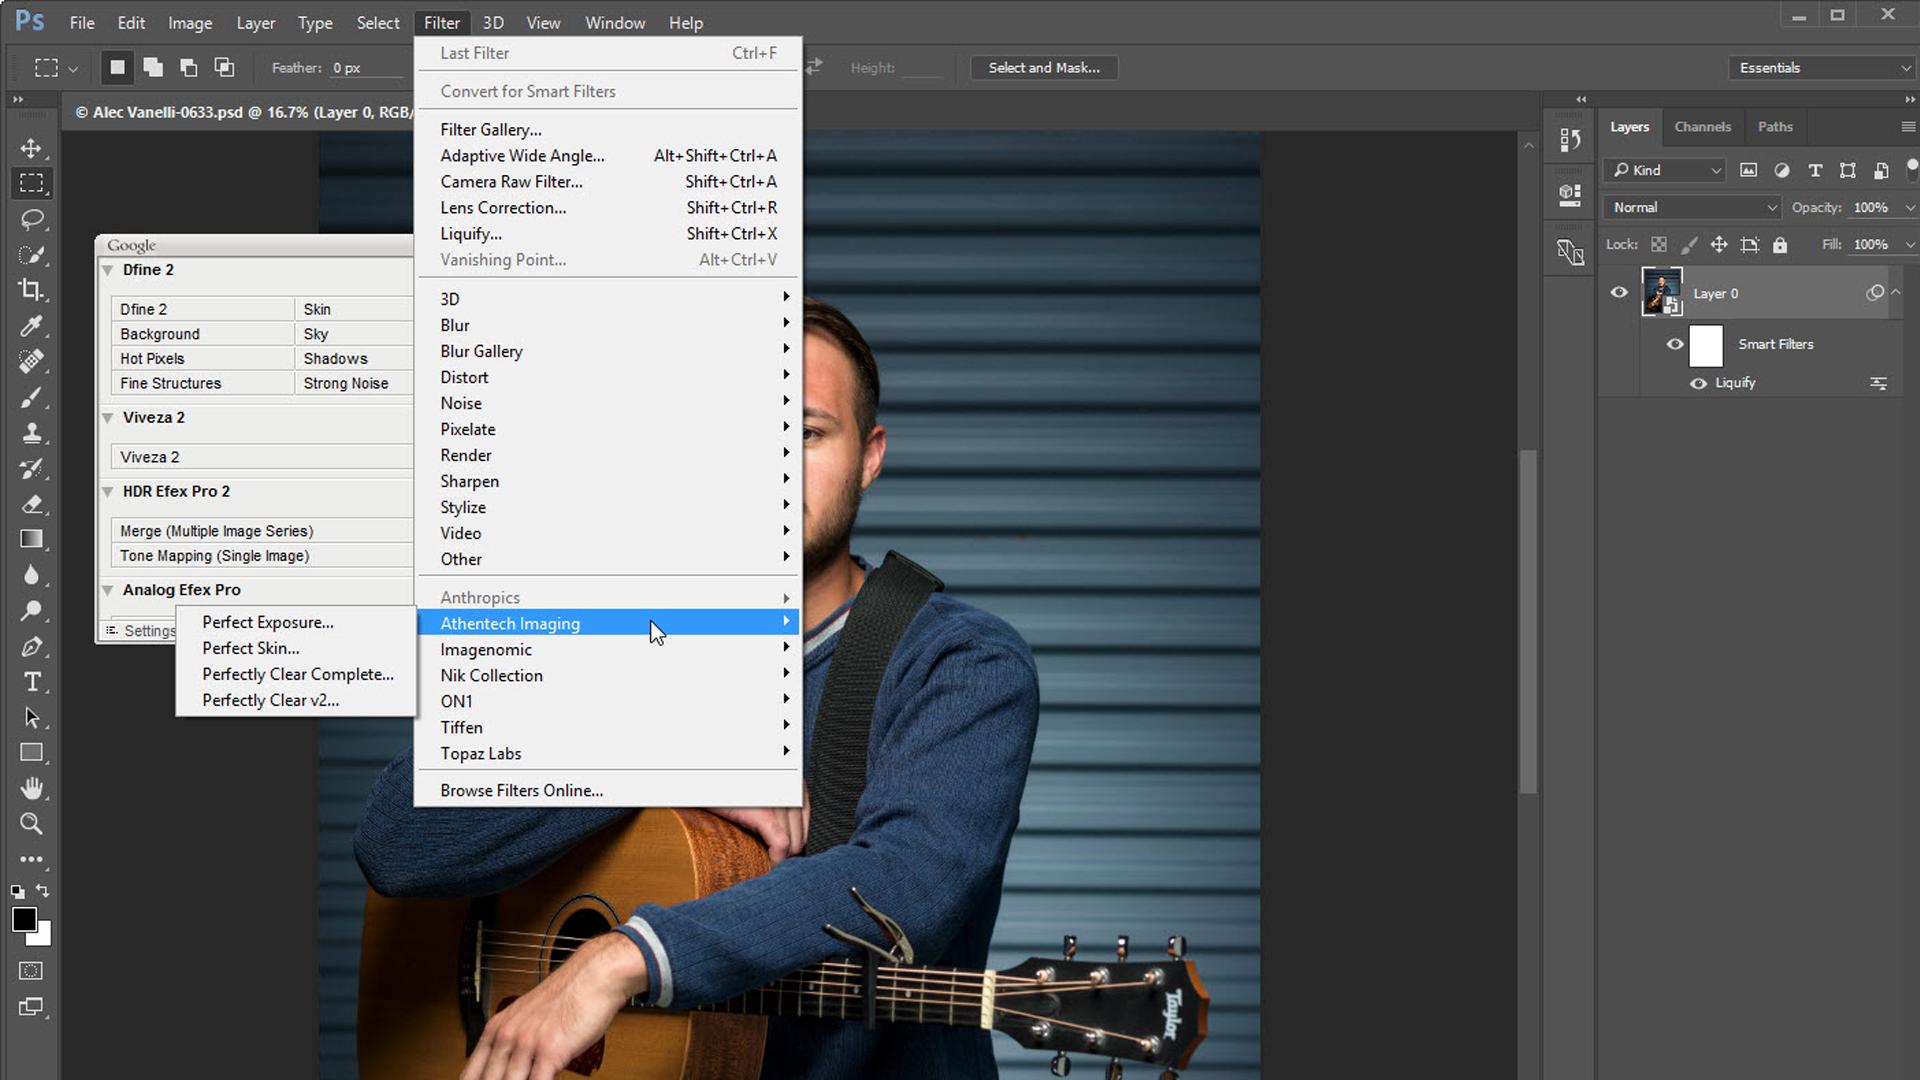 Adobe photoshop cc 2015 no 3d menu | 3D panel settings in Photoshop